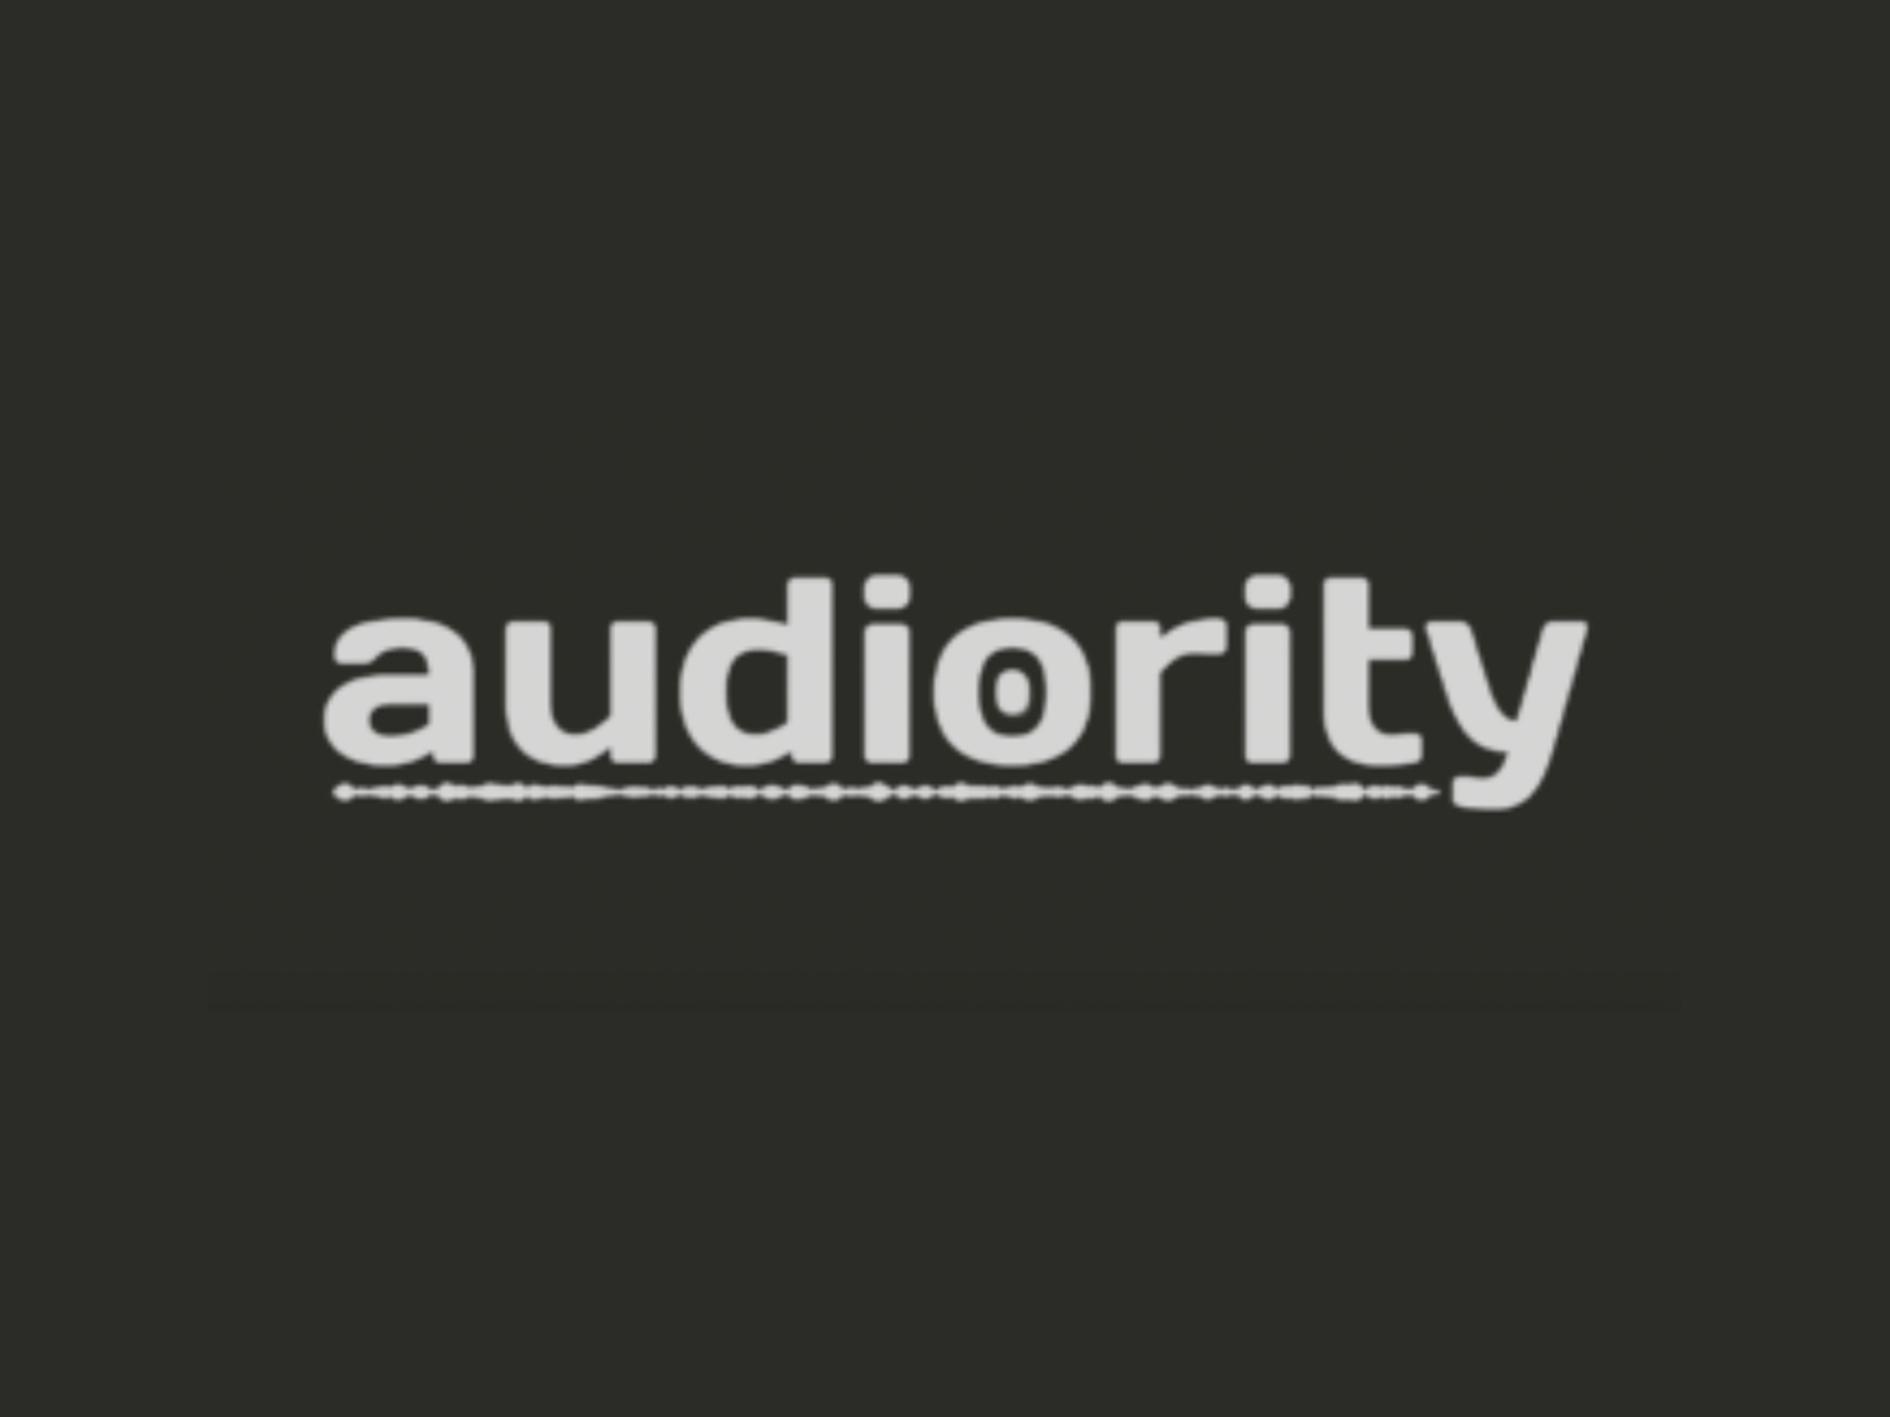 Audiority